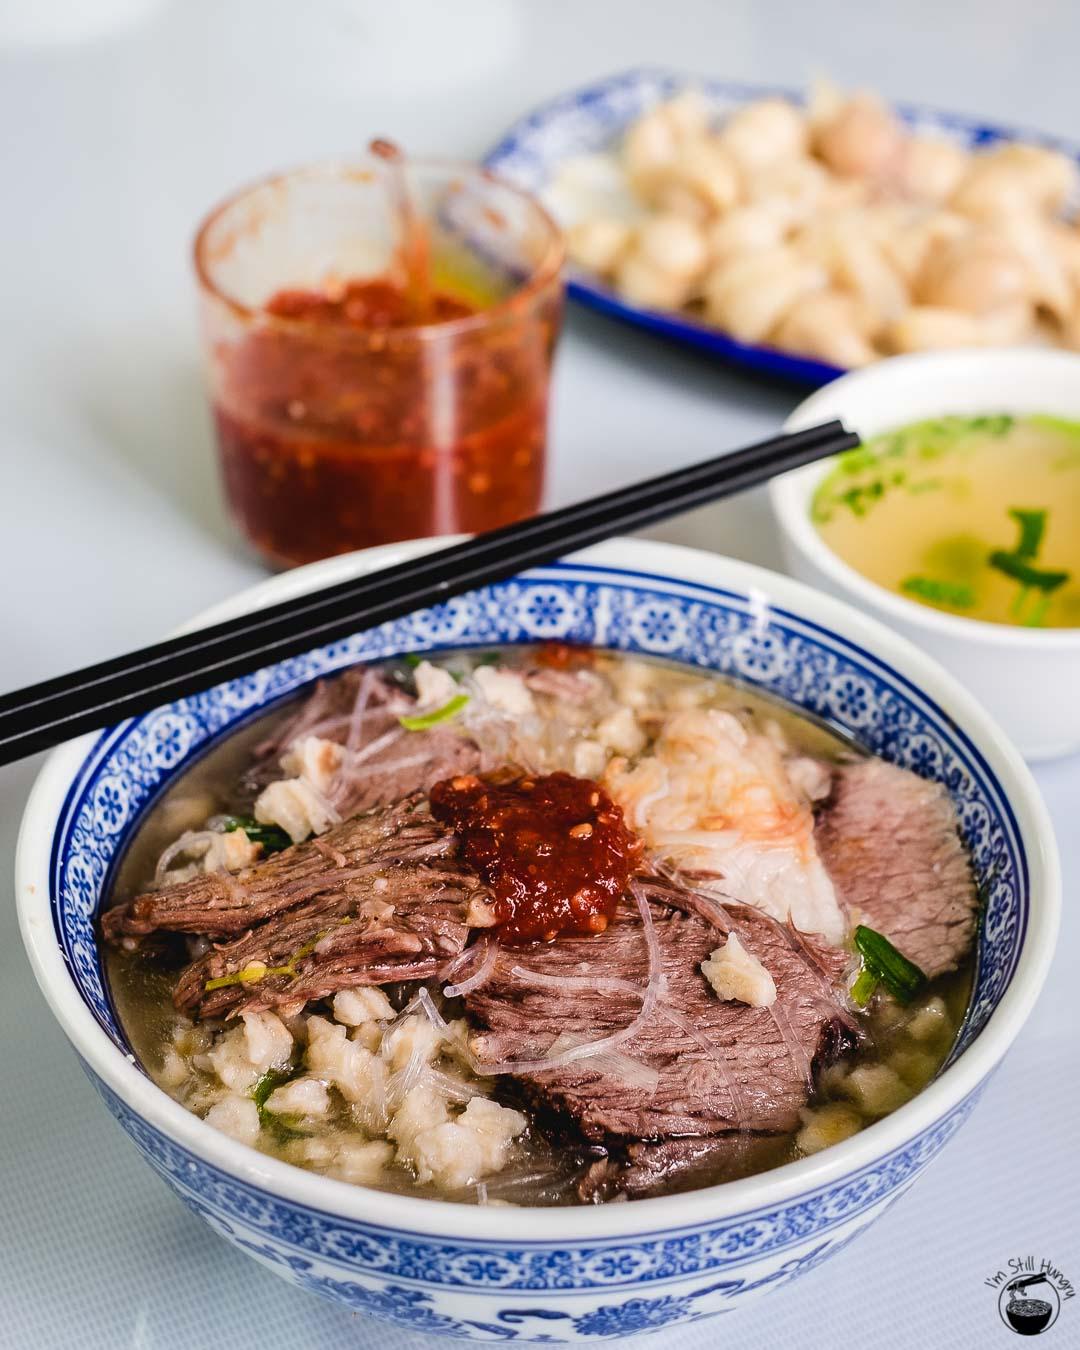 羊肉泡馍 (yang rou pao mo) Hui Min Jie Xi'an Muslim Street Food